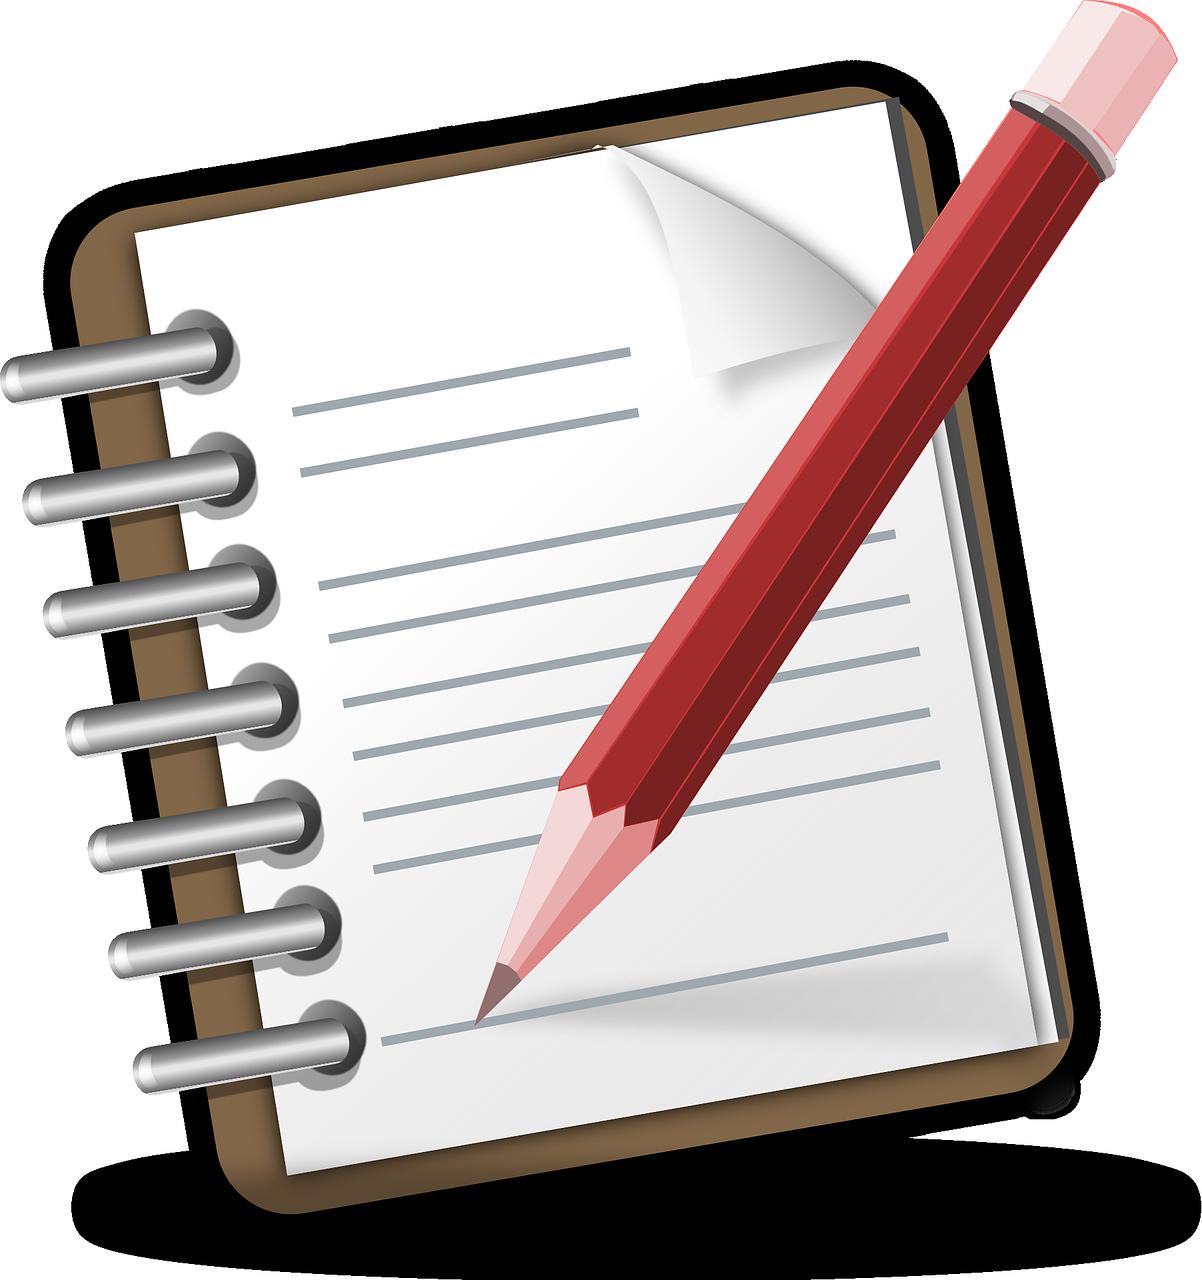 Orgnaisation Image (icanbea: Notepad Graphic)